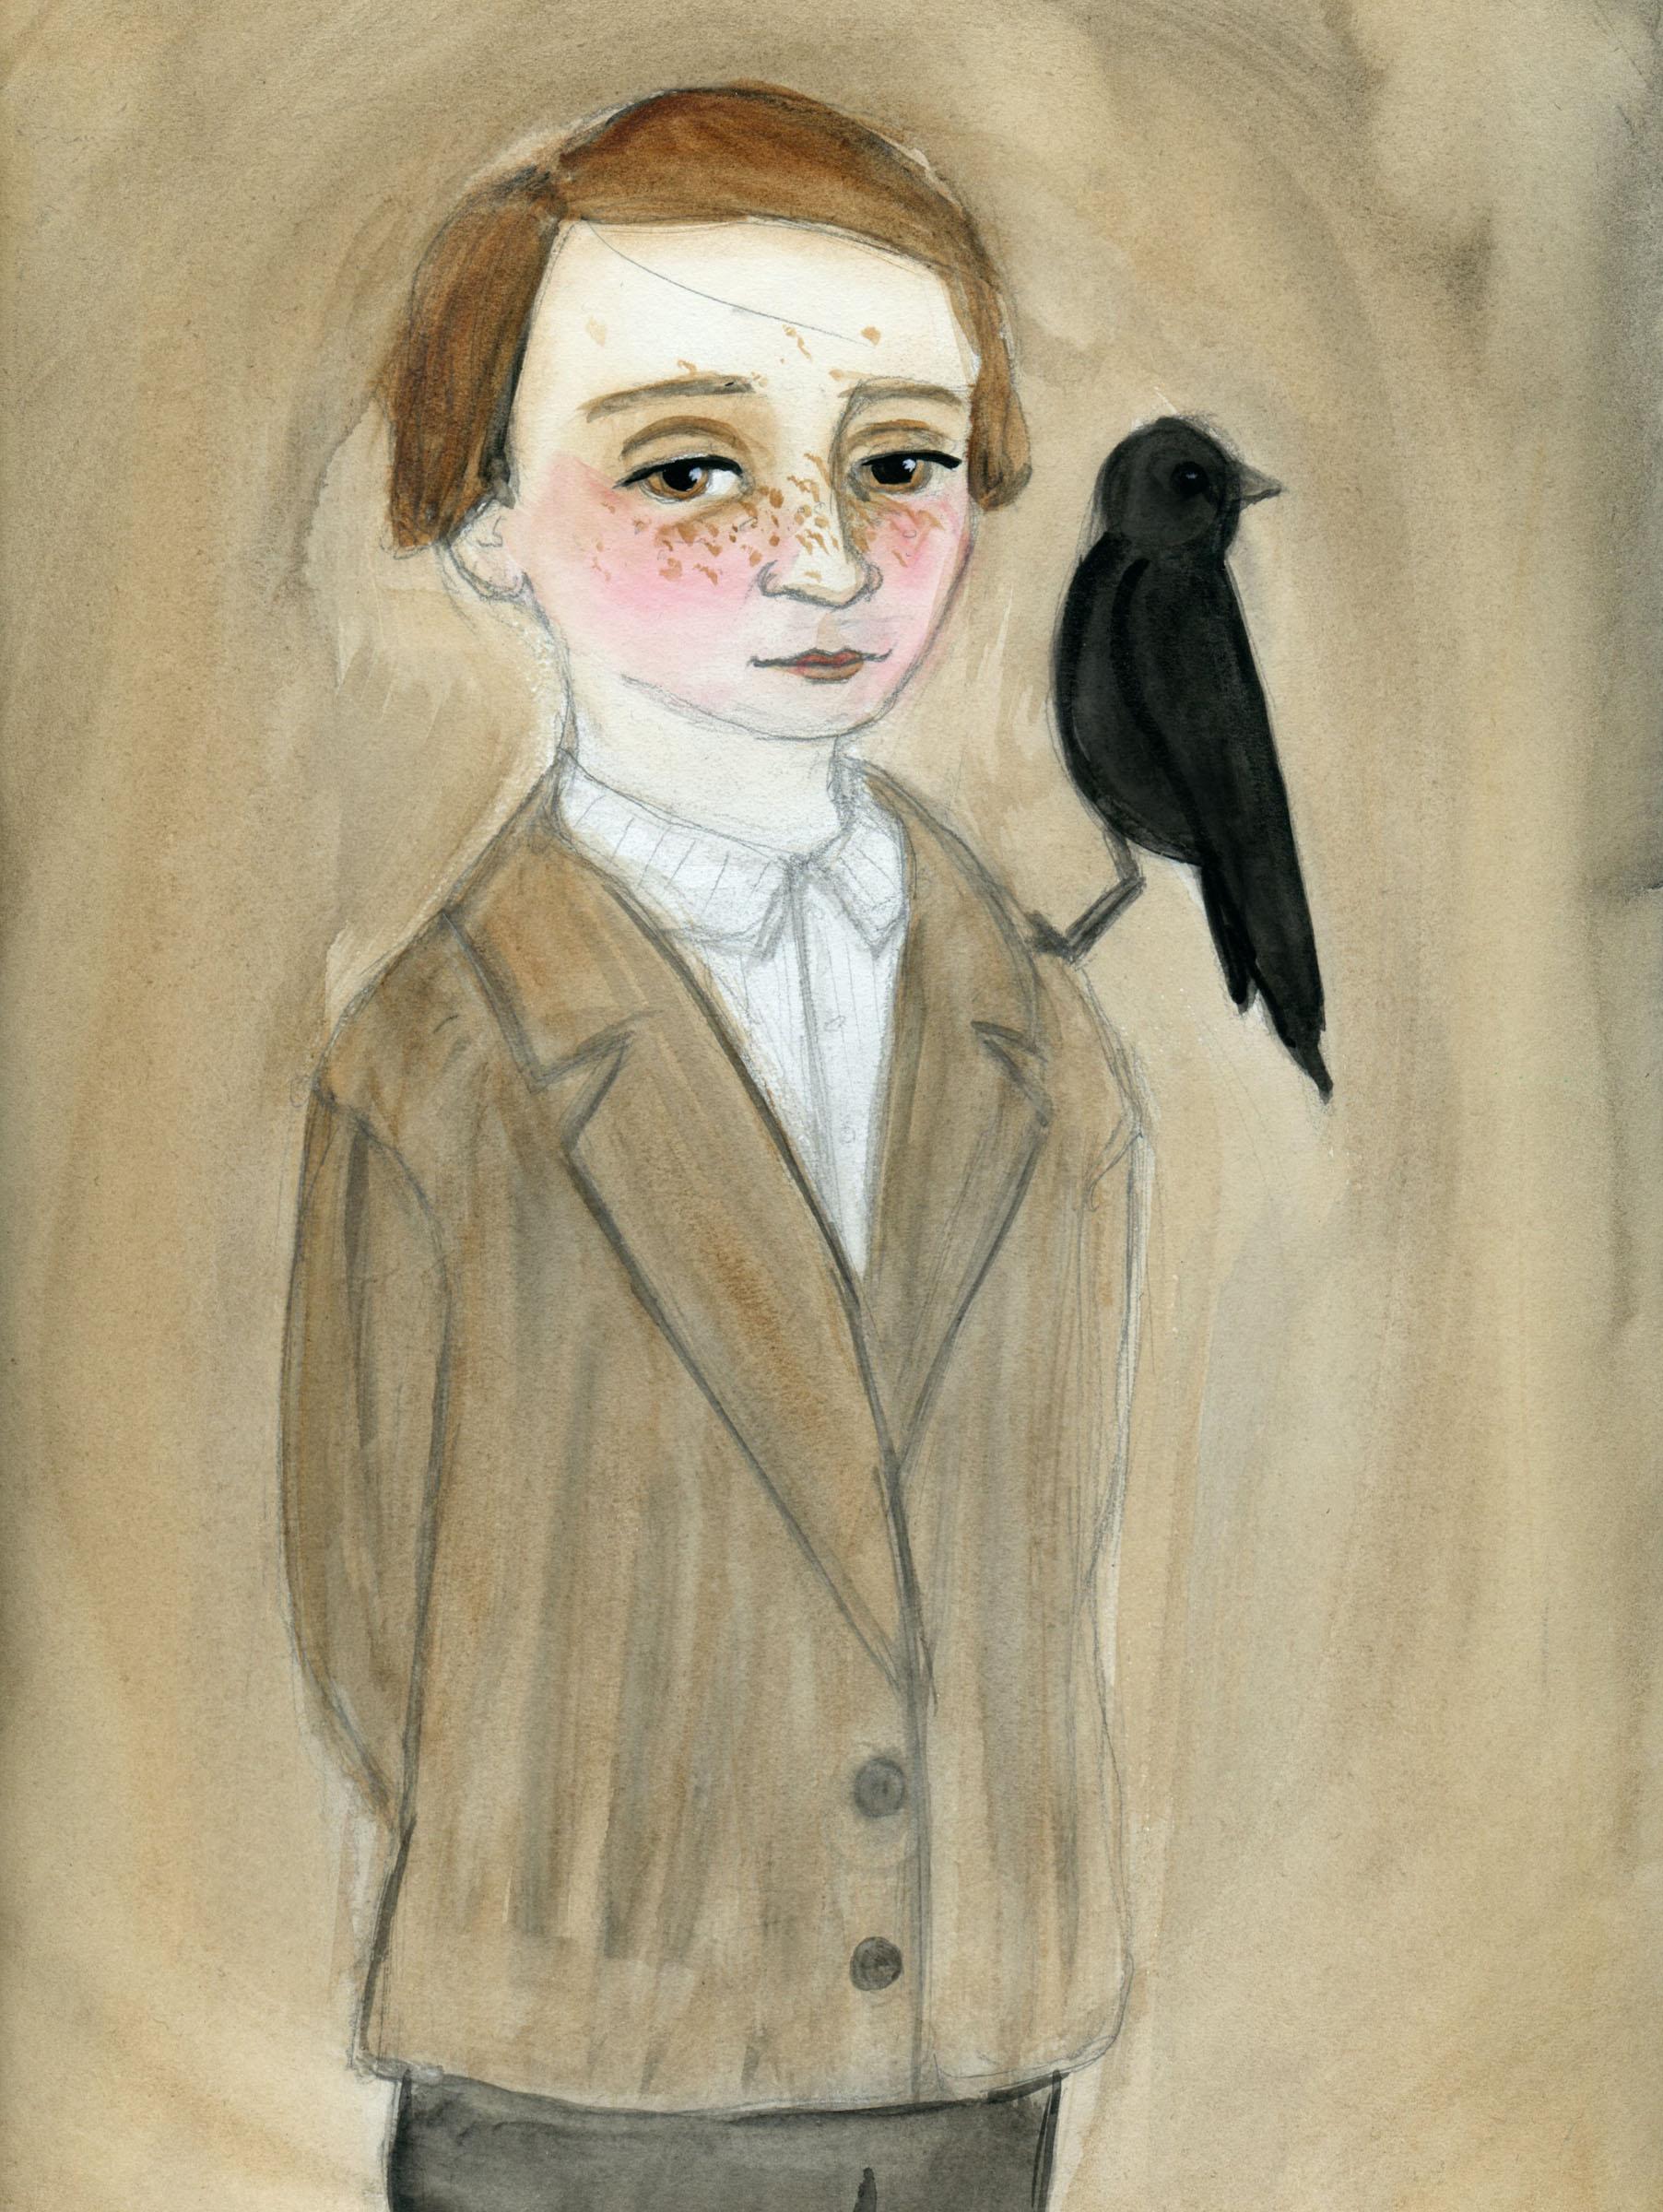 Patrick and His Black Bird